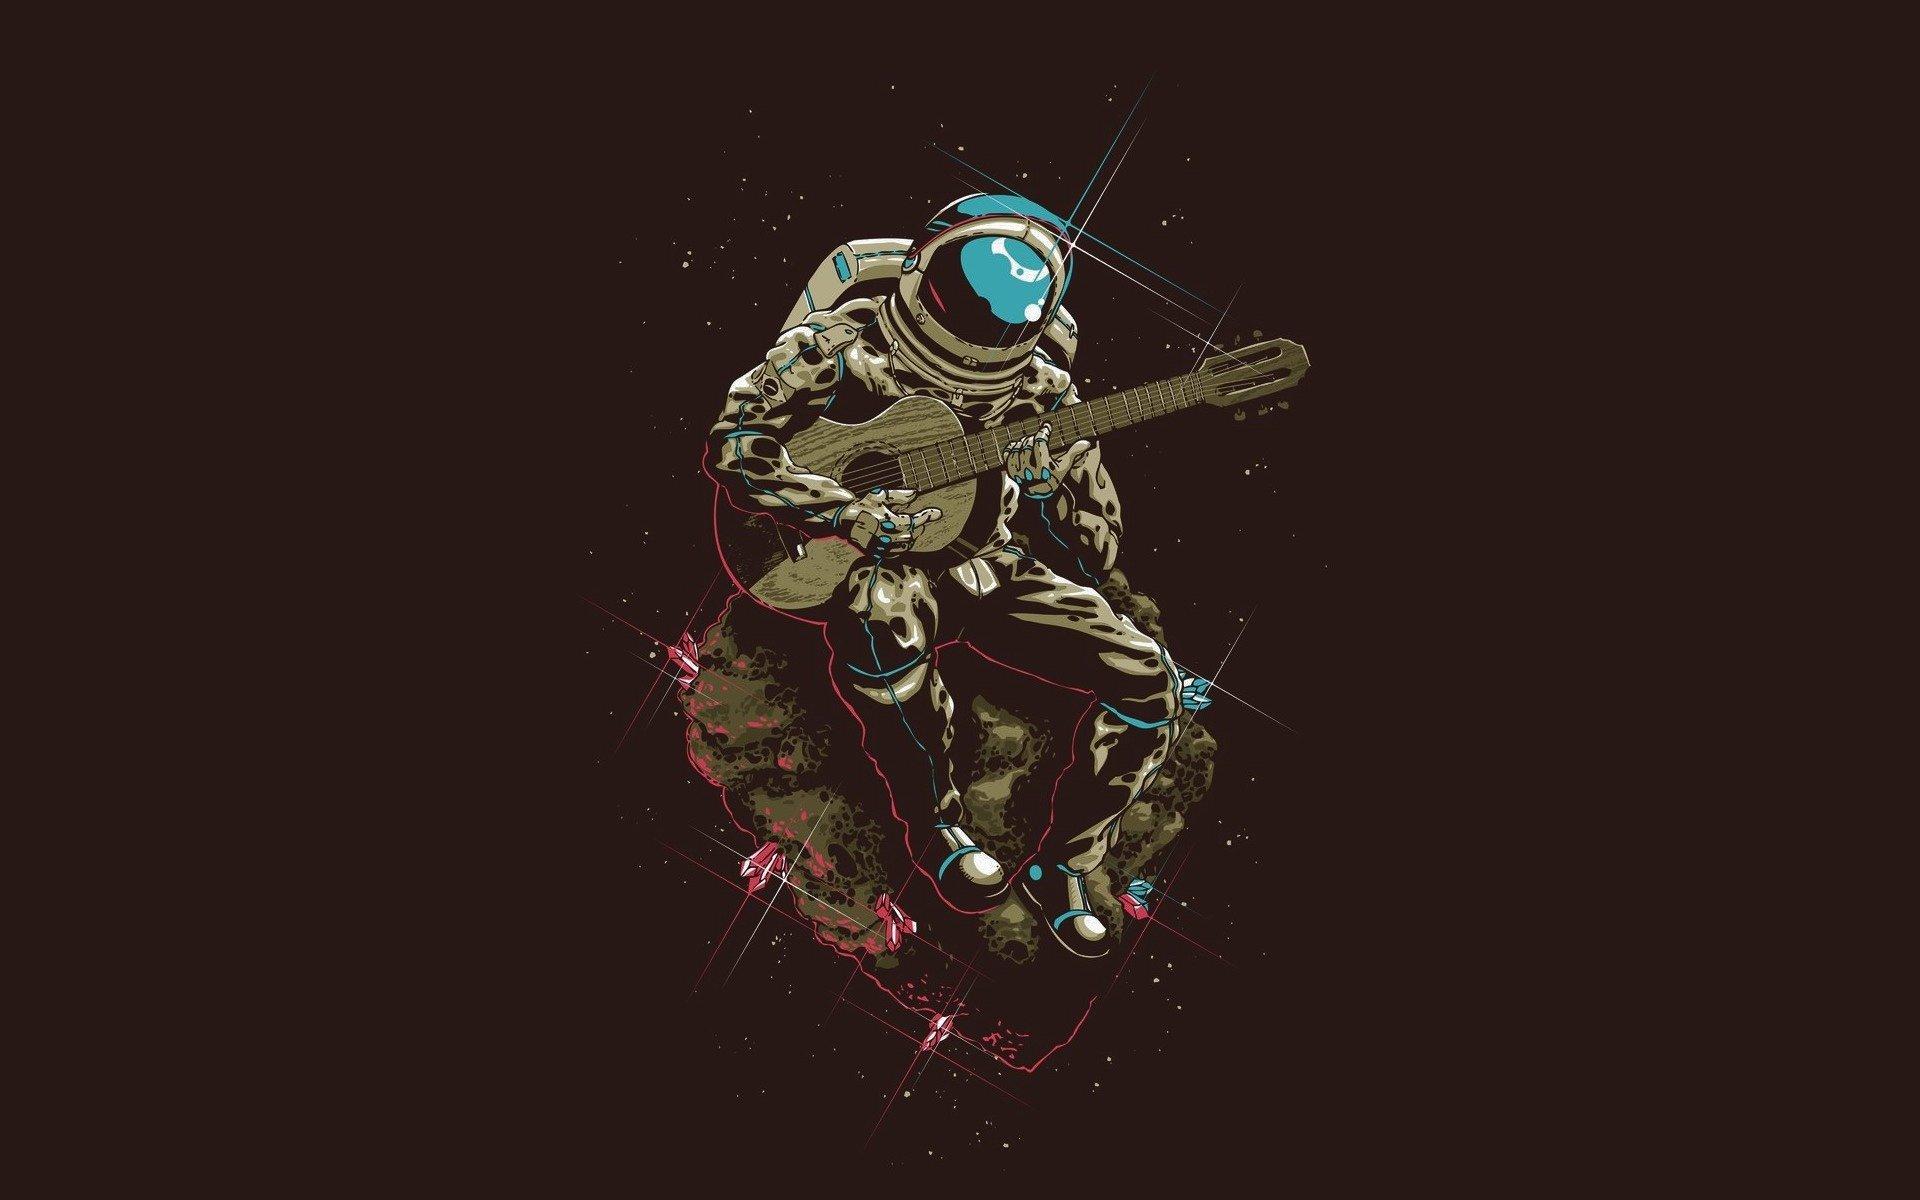 Imagenes Para Fondo De Pantalla: Astronaut Playing The Guitar Fondo De Pantalla HD